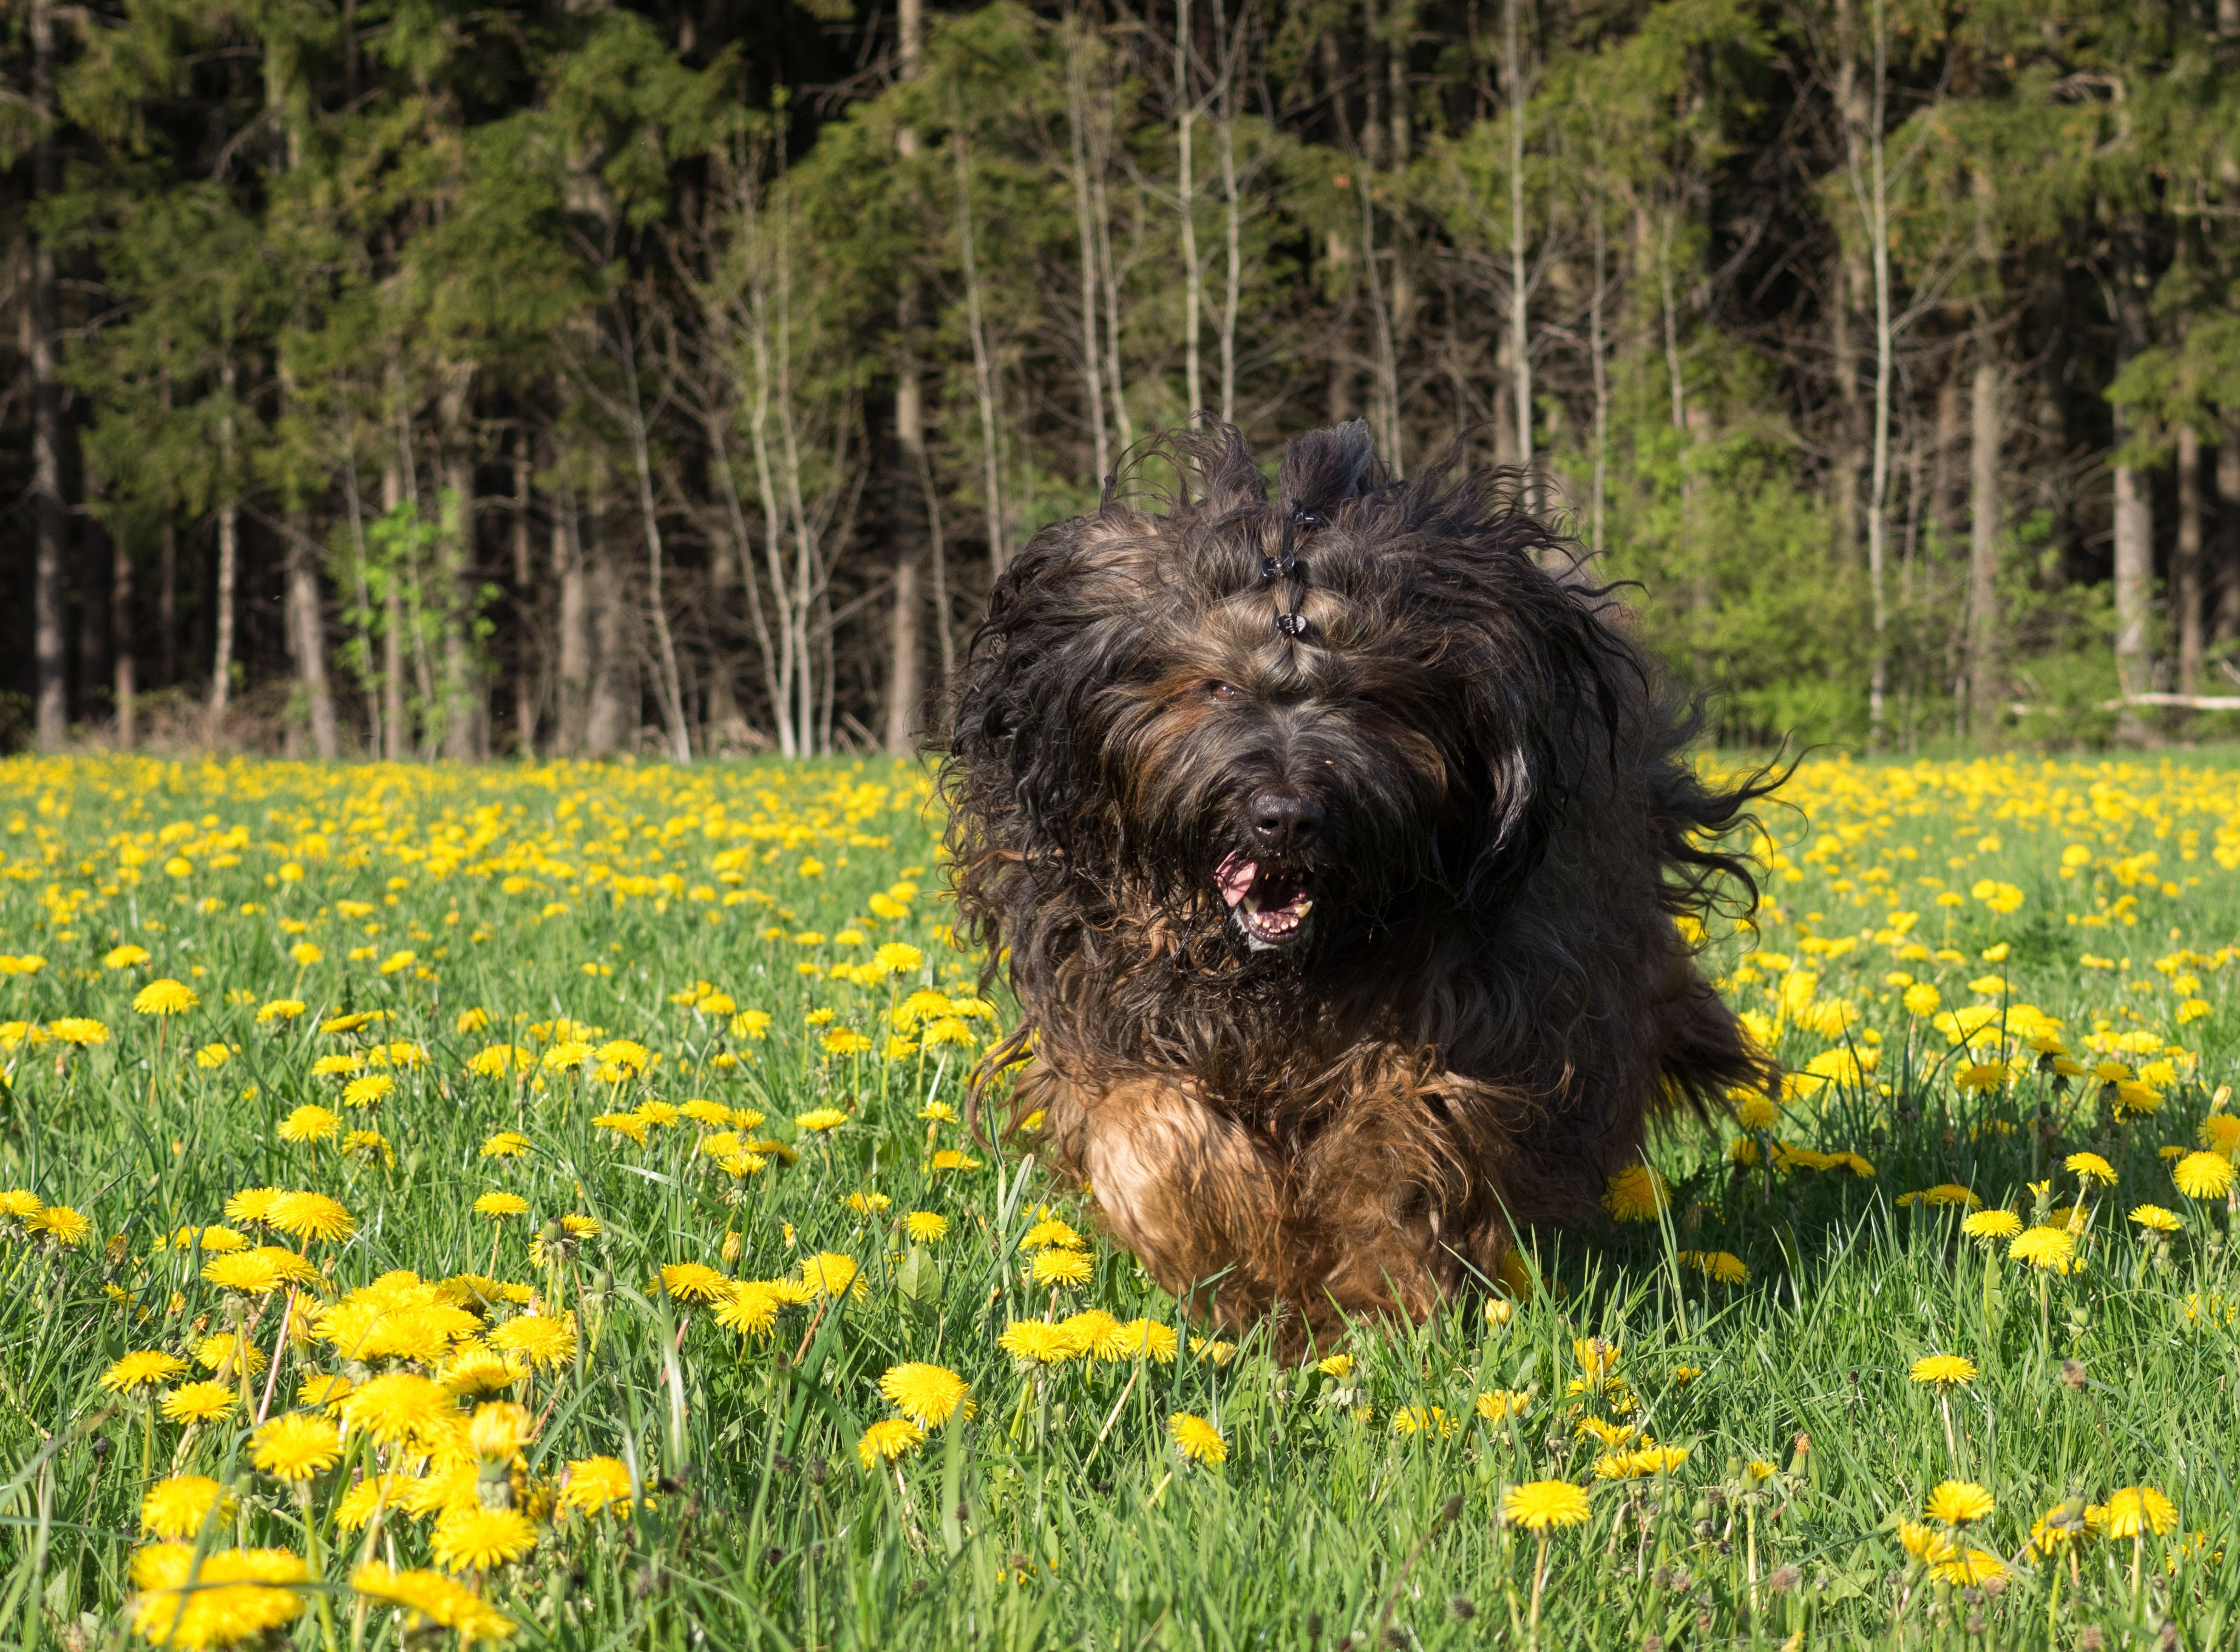 Tibetan mastiff running in field